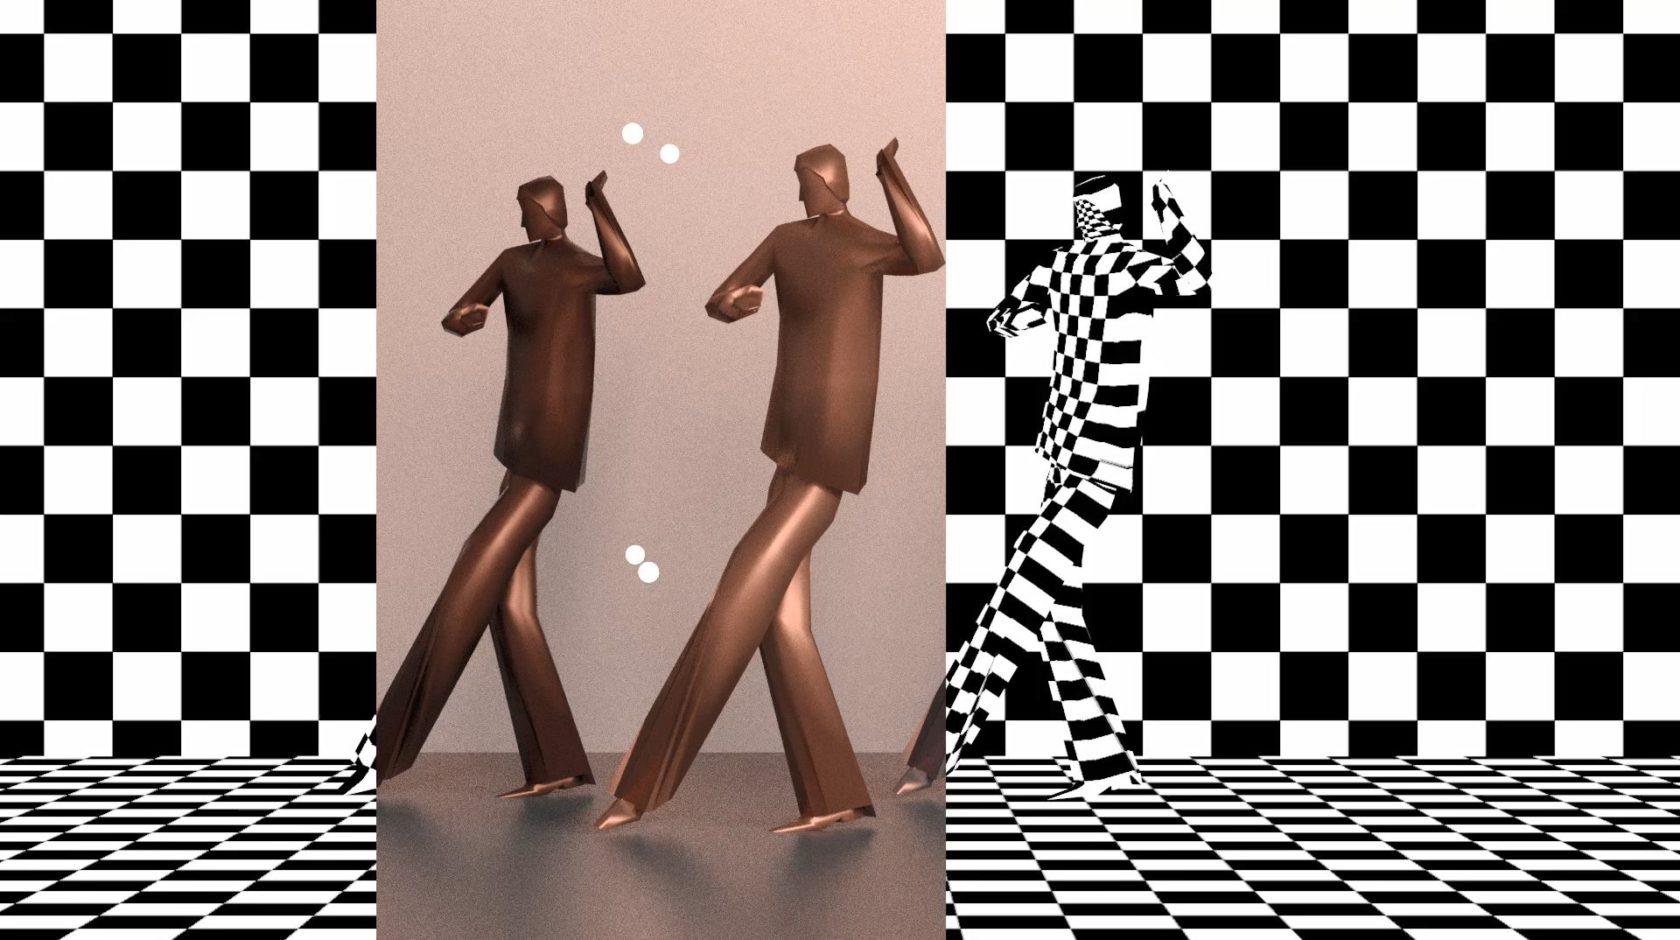 Murad-design-studio-designagentur-murad-ghanaimy-design-werbung-kreativ-kunst-pop-art-animation-Kampagne